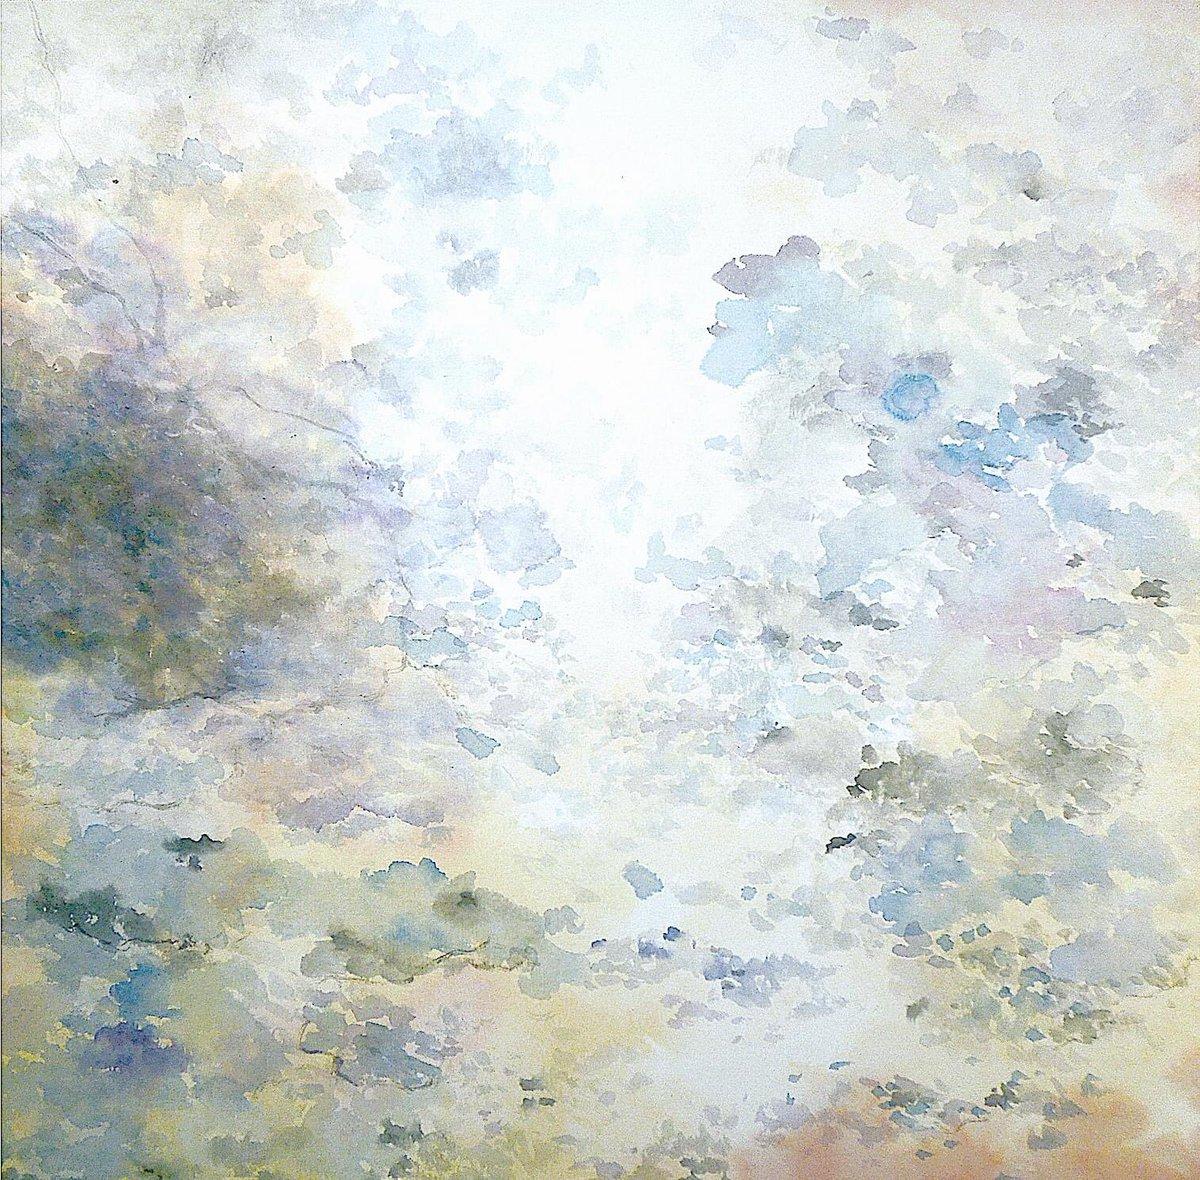 "Winnie Hui, Physiognomy of Stone, 2012, ink on rice paper, 27.5""x27.5"" #artifact212 #art #painting #abstractart #fig #artcollector #artexhibitions #newyorkarts #contemporaryartpic.twitter.com/GOiJPlAQXL"